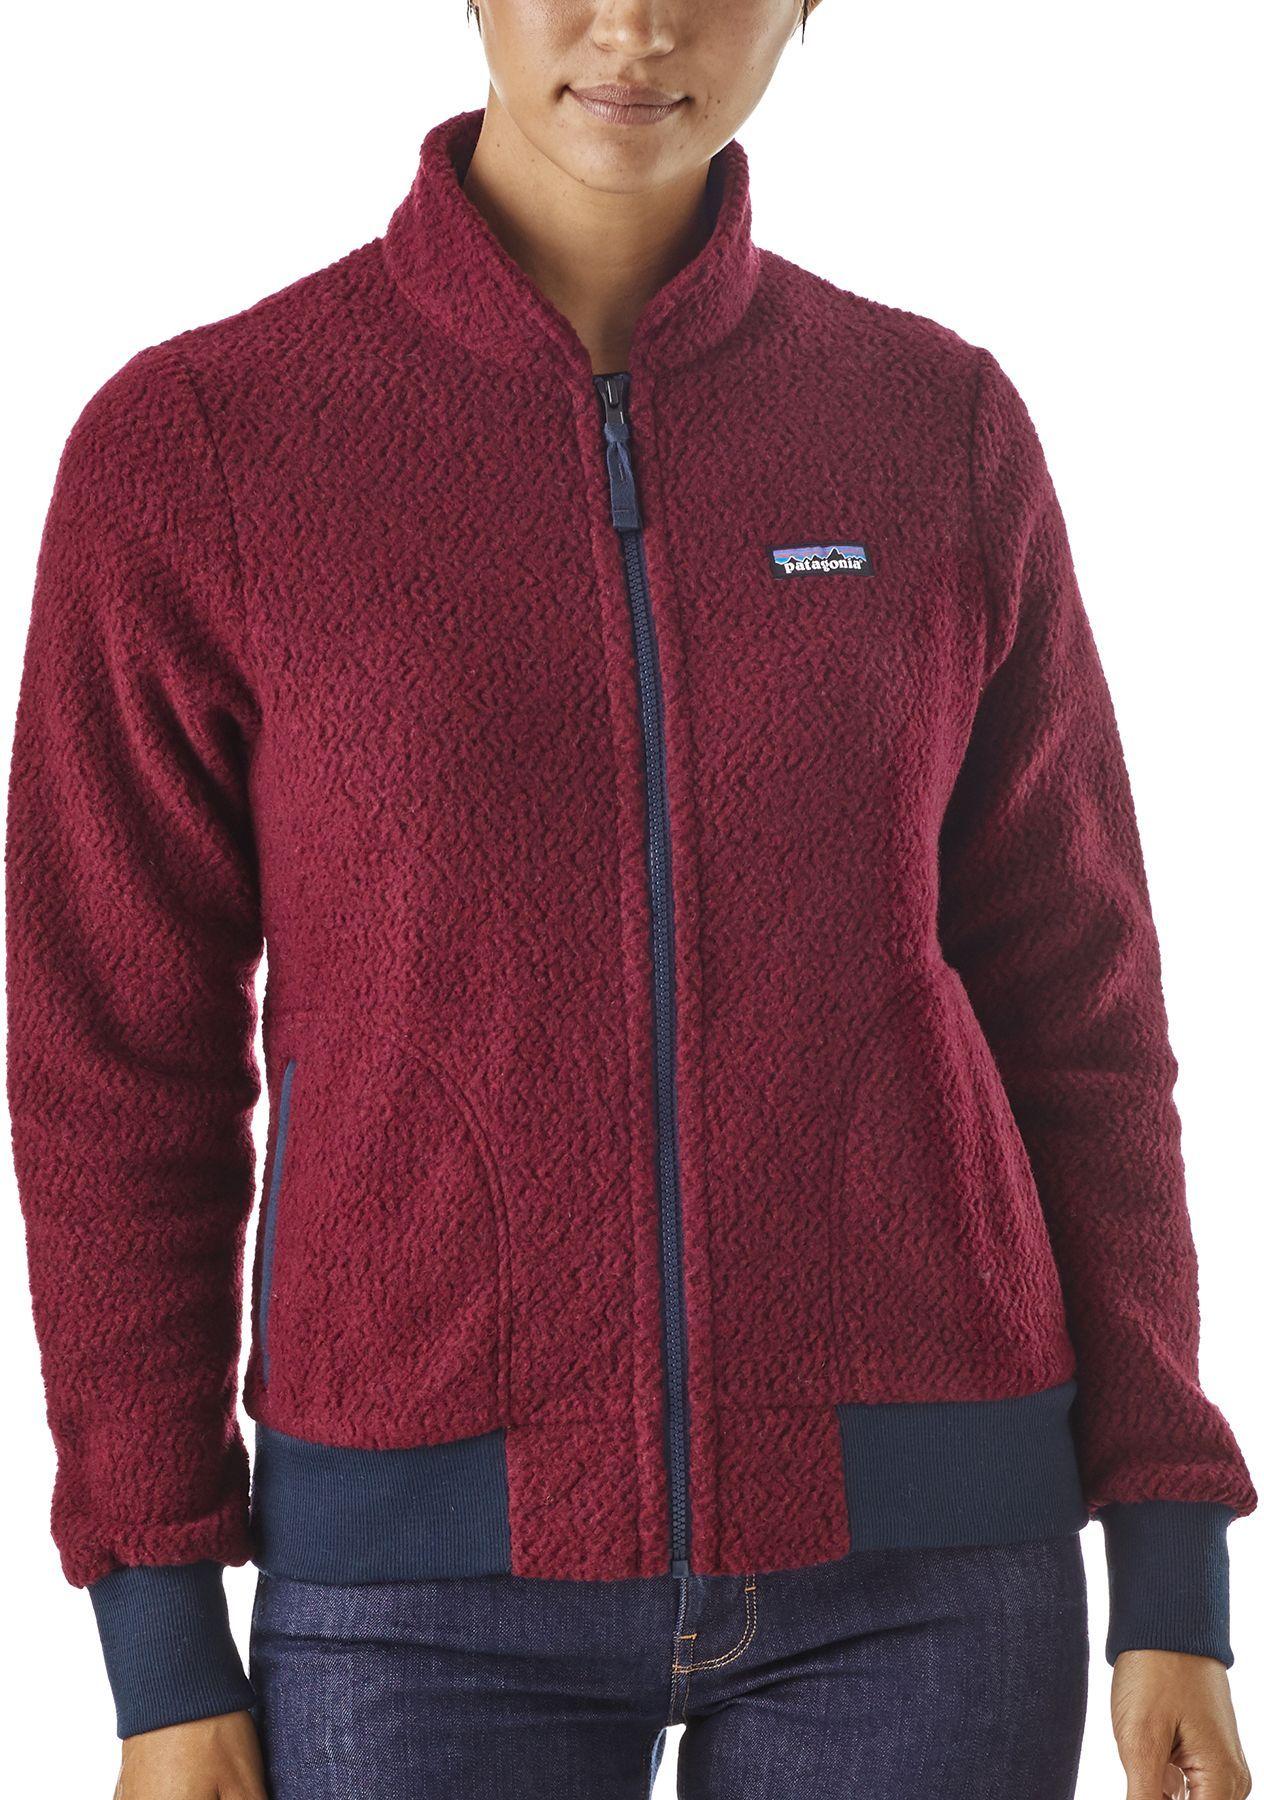 def508740ae12 Patagonia Women s Woolyester Fleece Jacket